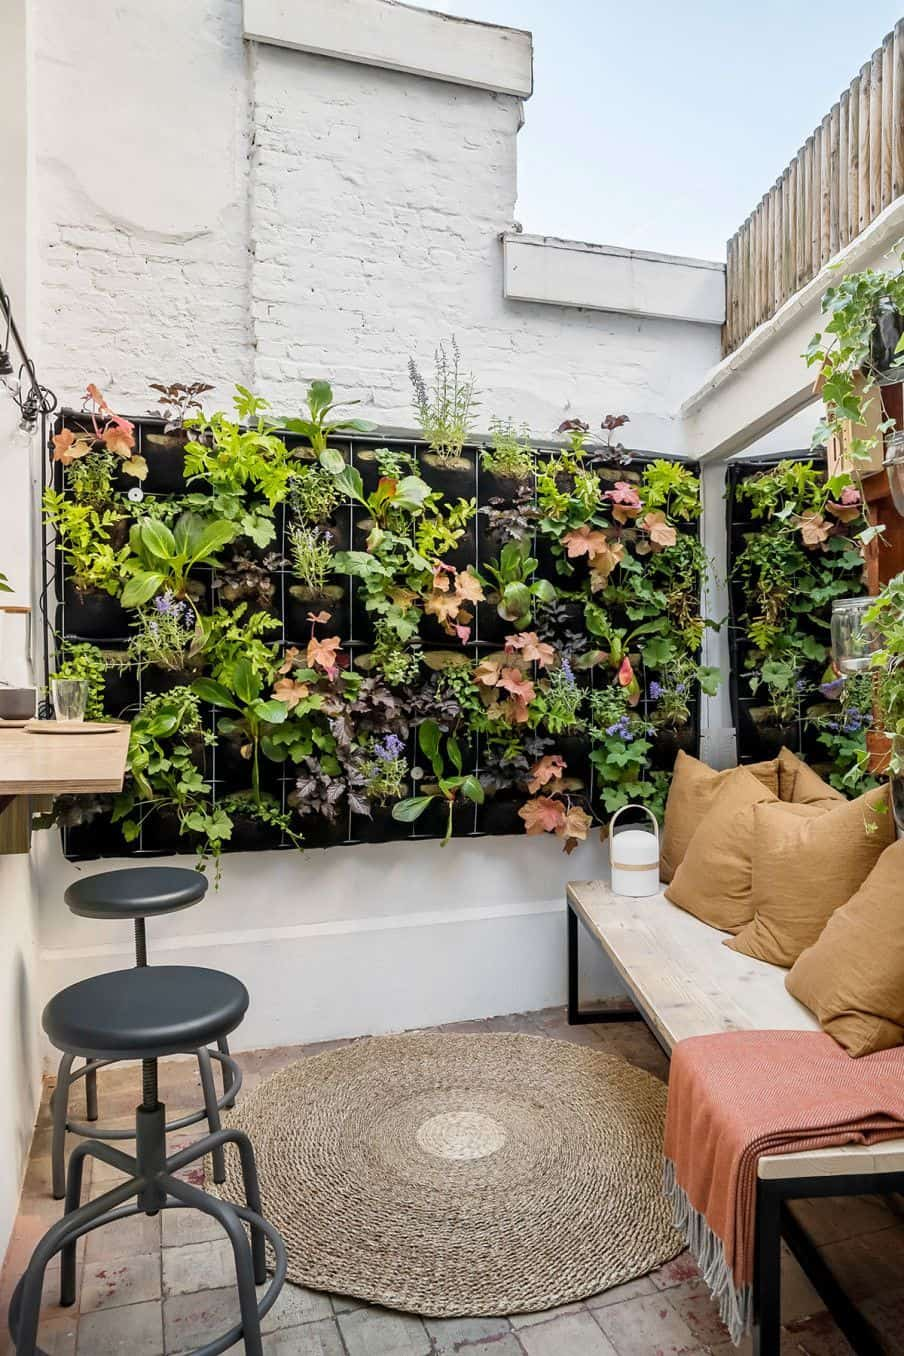 plant wall on display